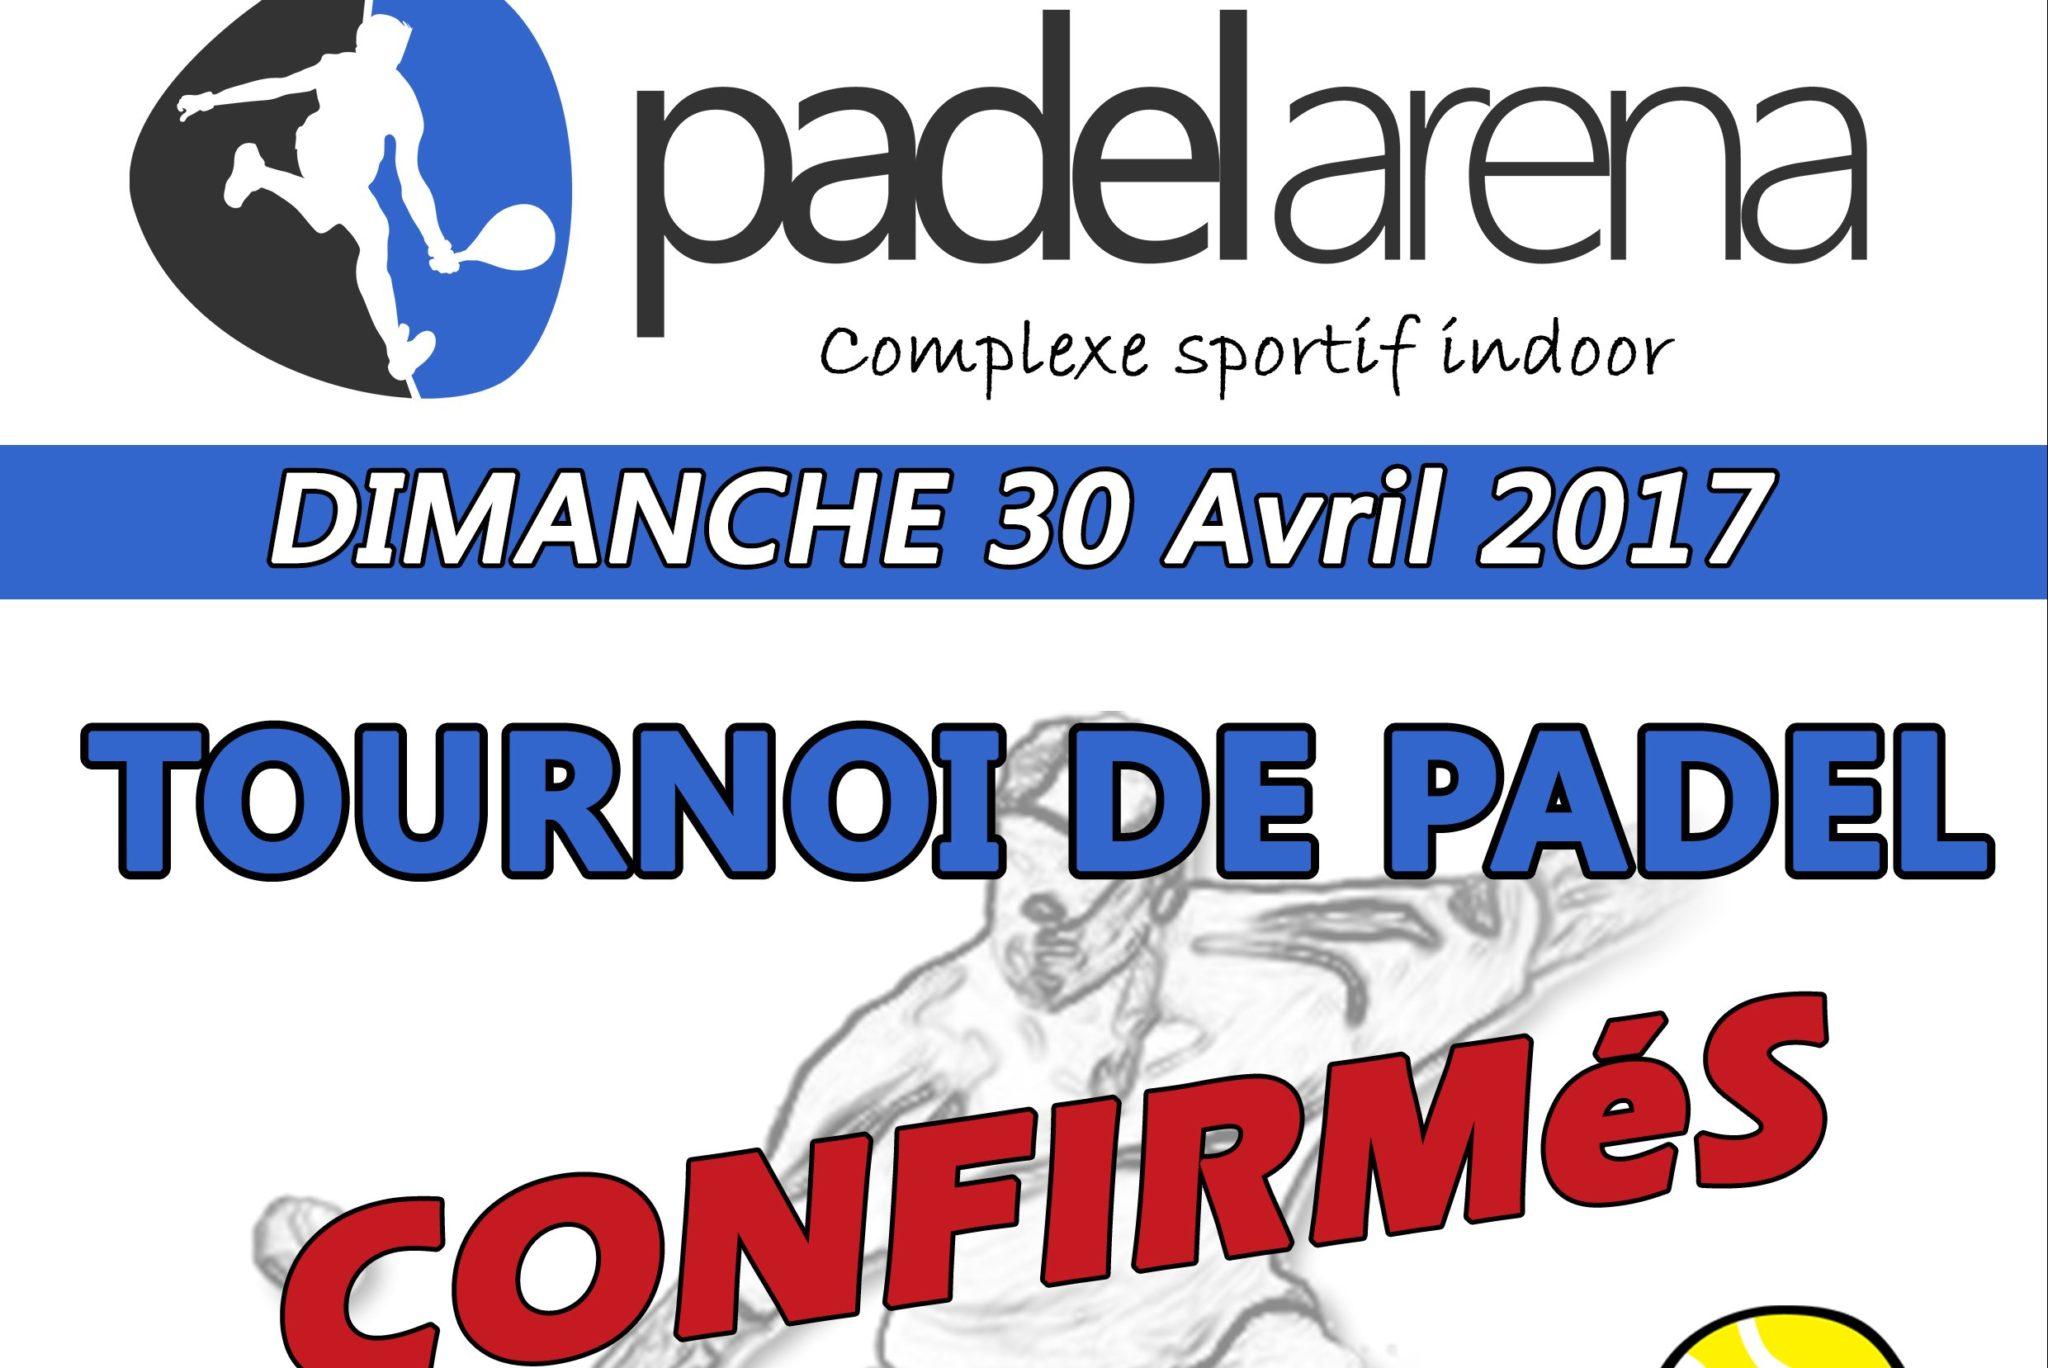 Padel Arena en mode tournoi ce we !